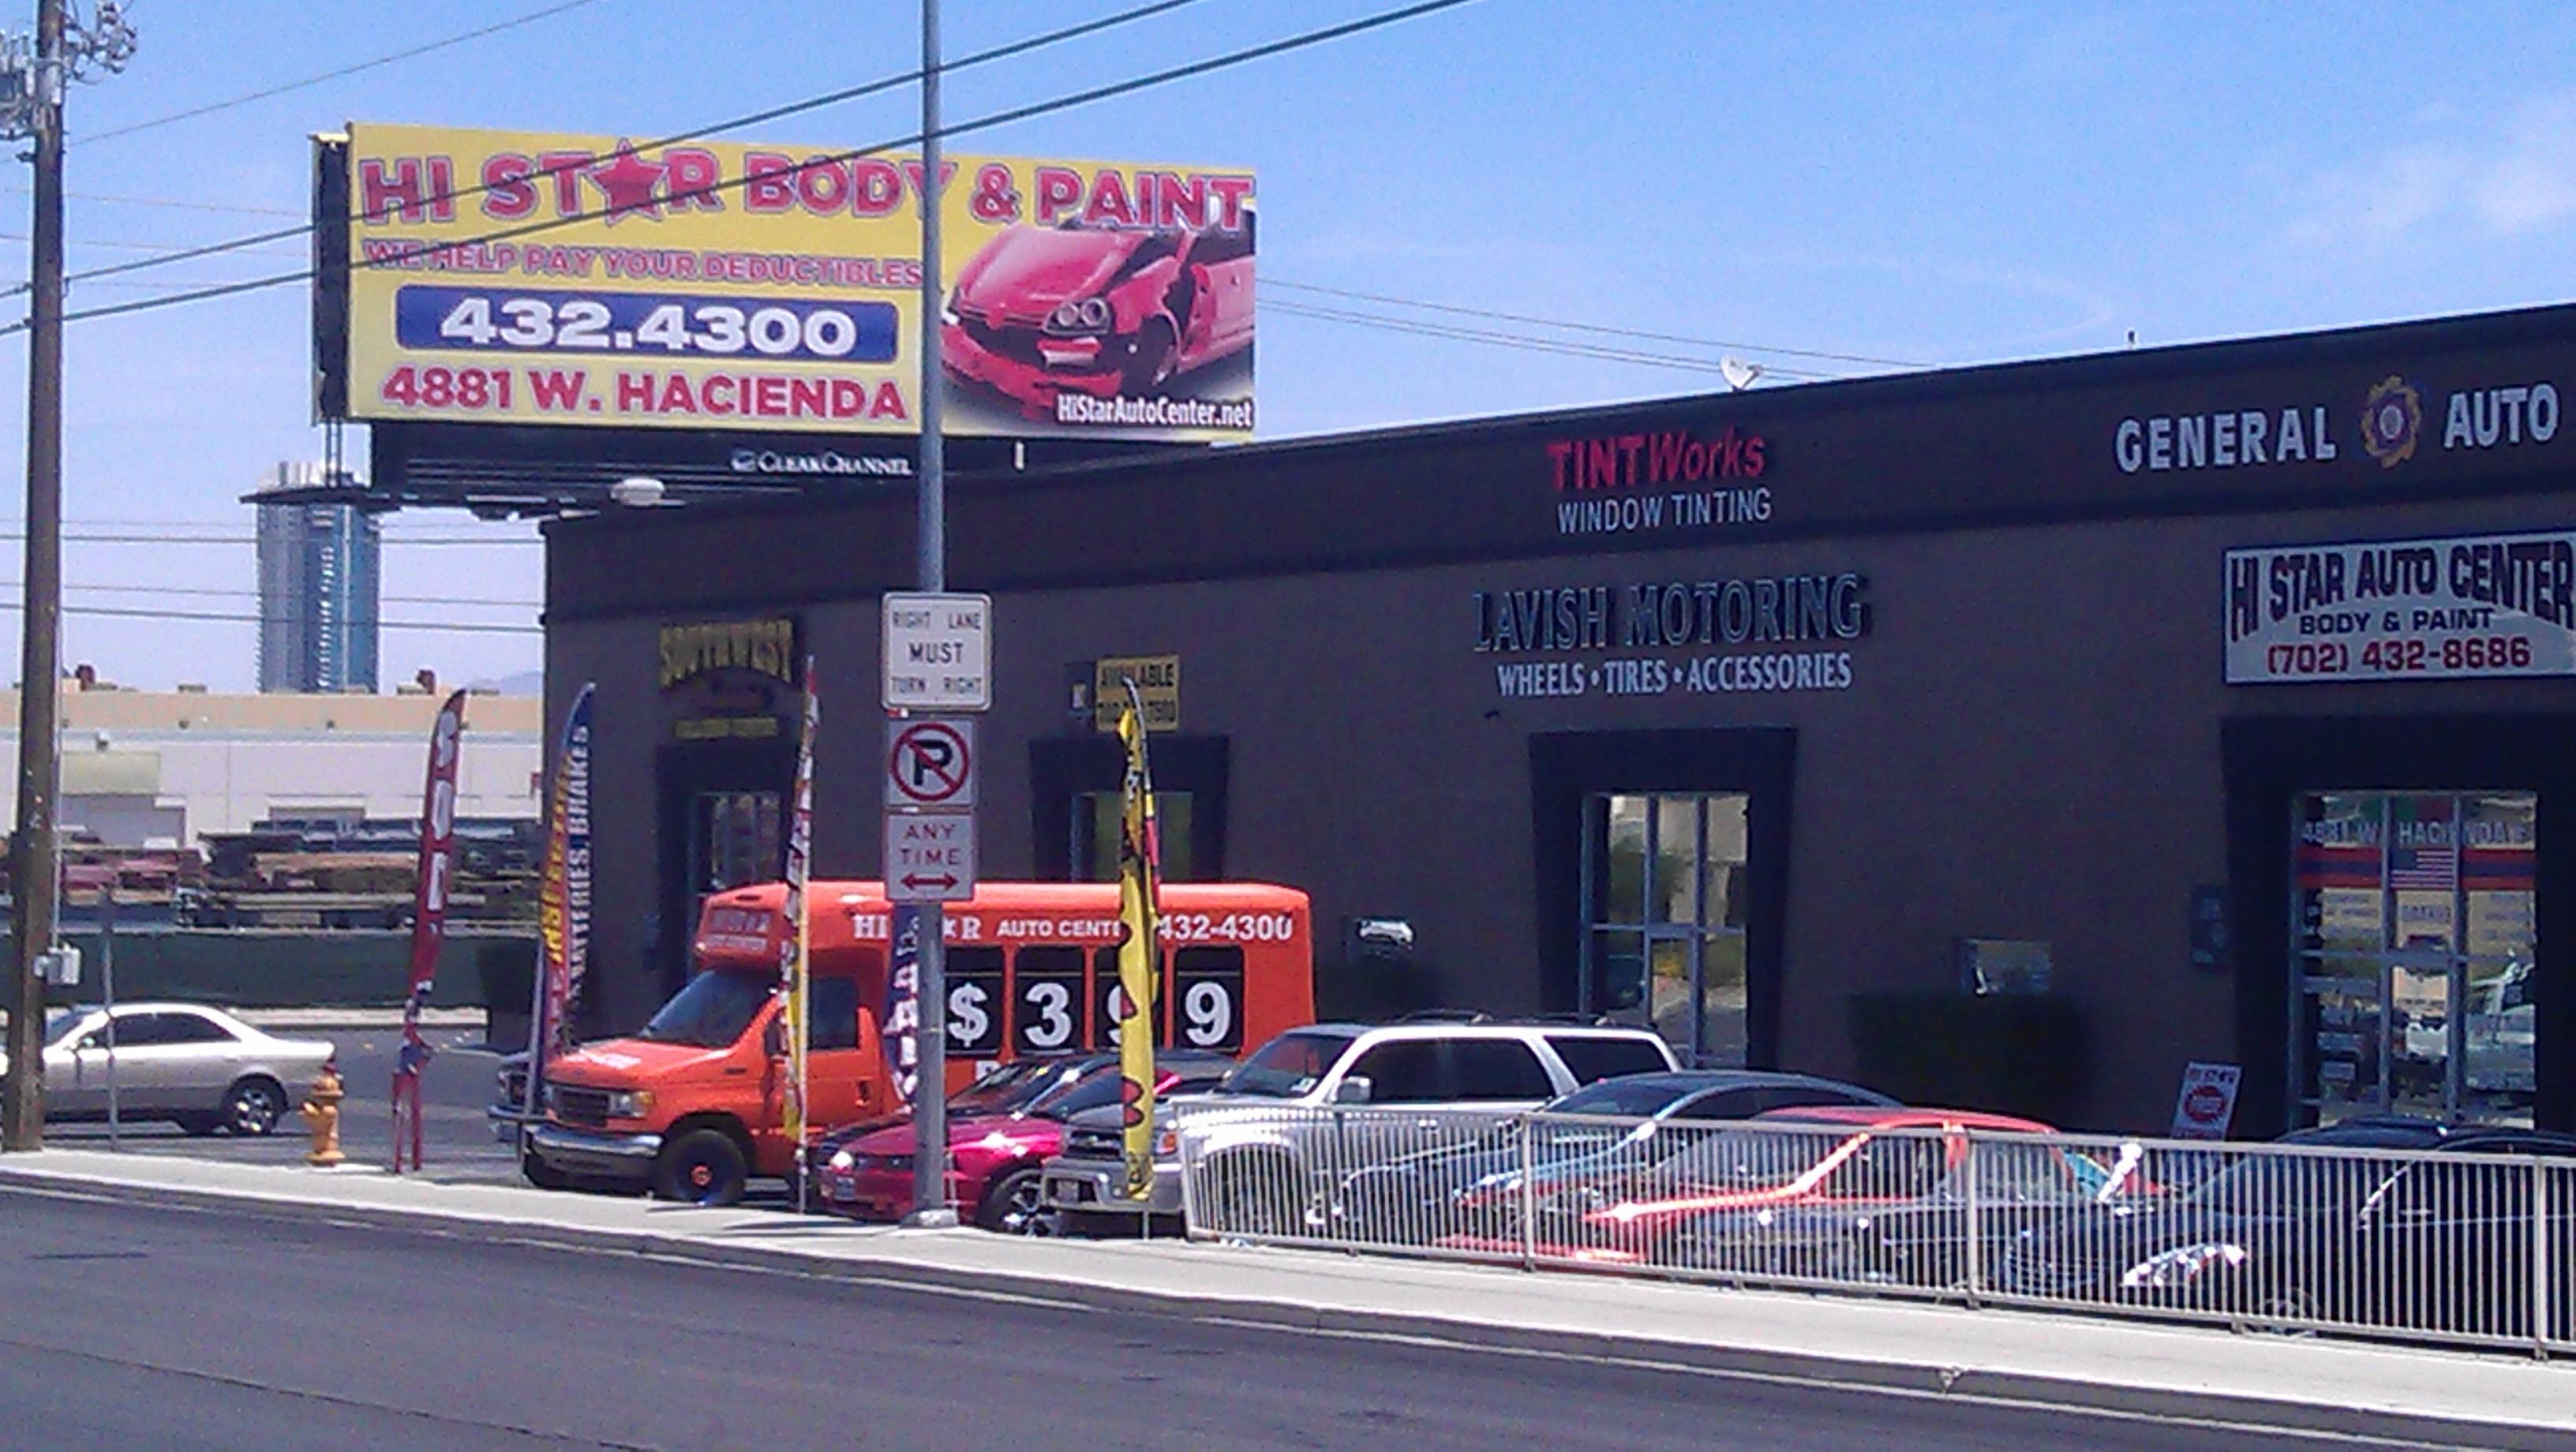 Billboard of Business